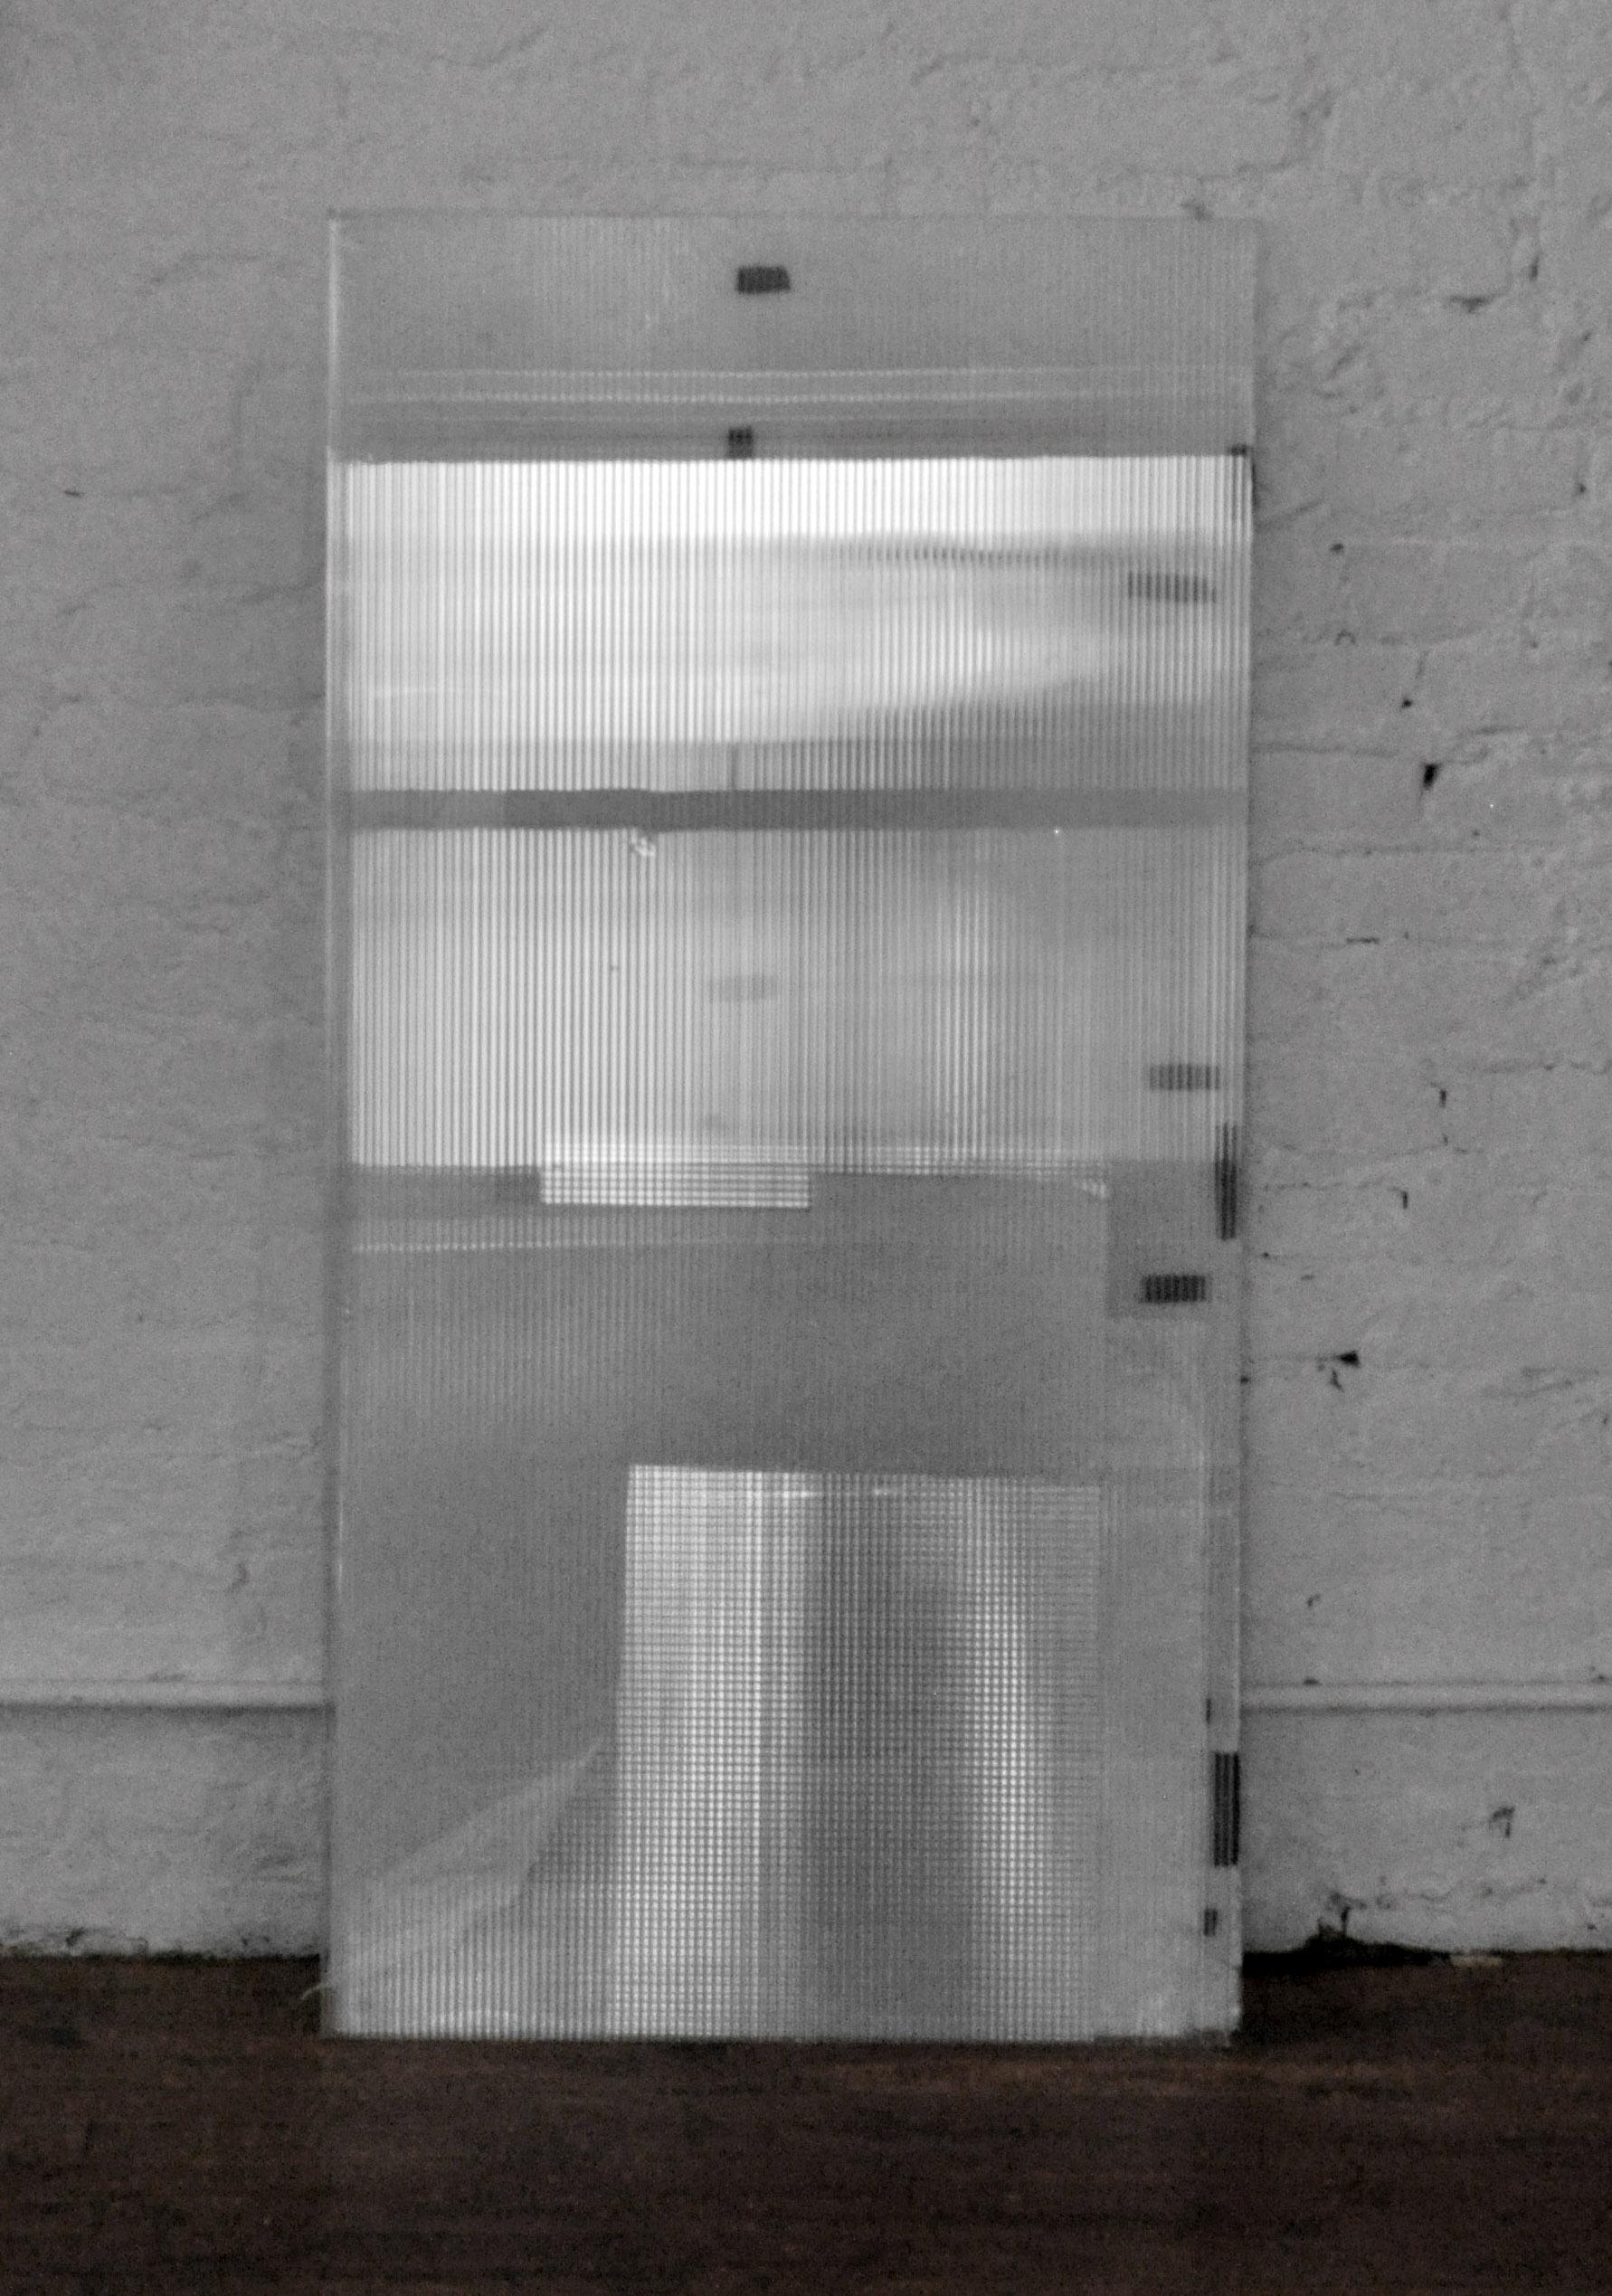 The Silver Window , polycarbonate sheets, black tape, acetate, 122 x 61 cm, 2016